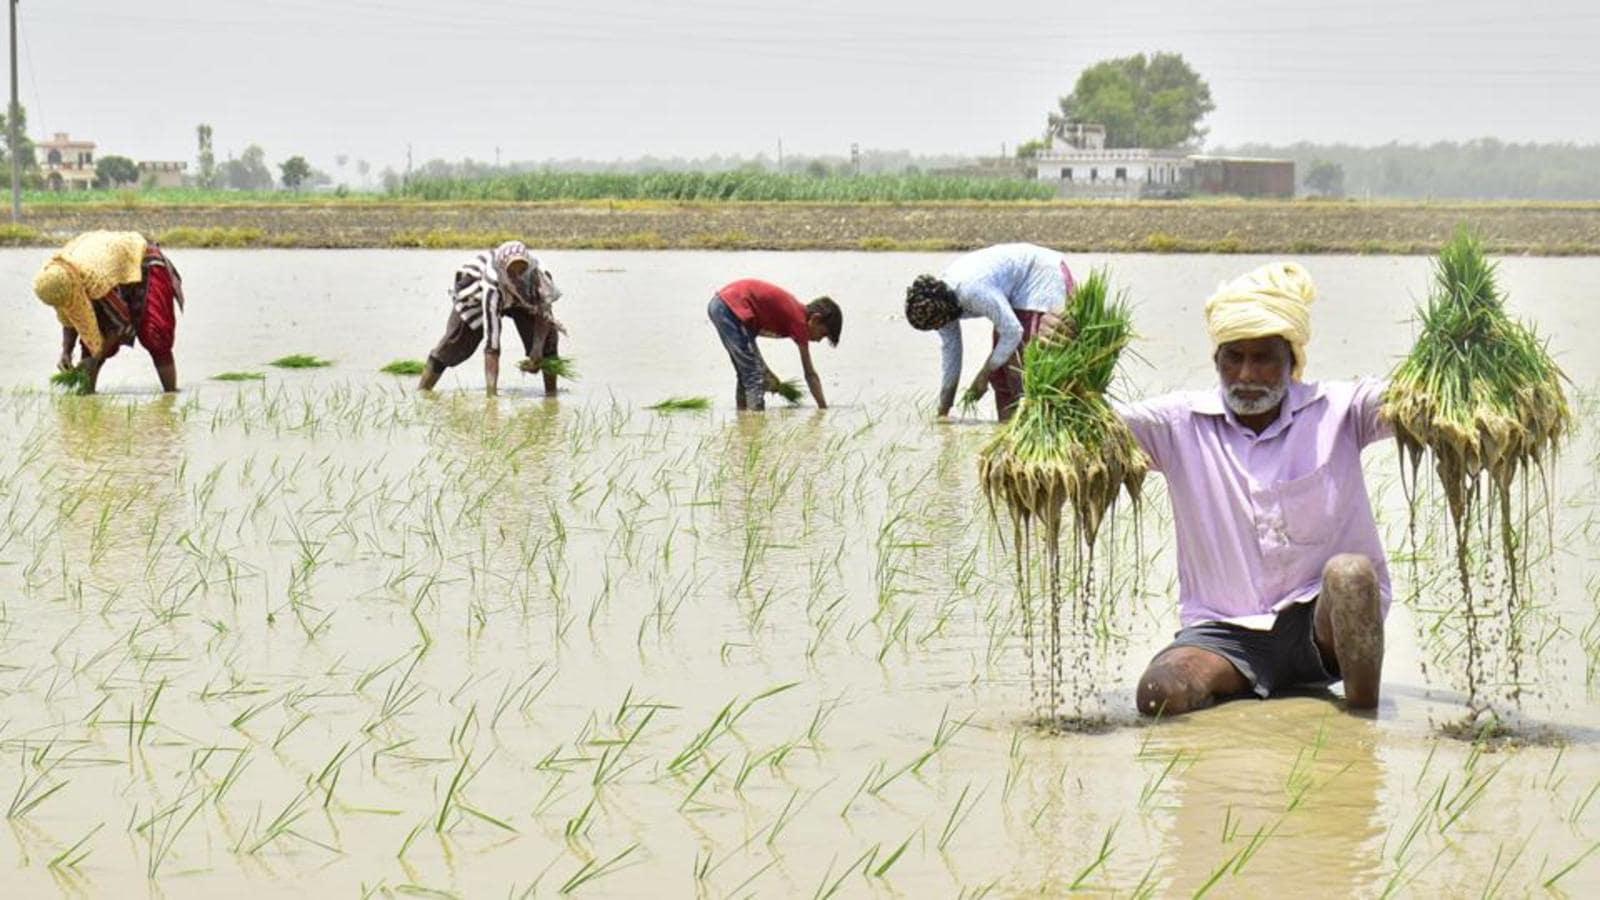 Punjab farmers go for multiple paddy varieties, sowing methods - Hindustan Times